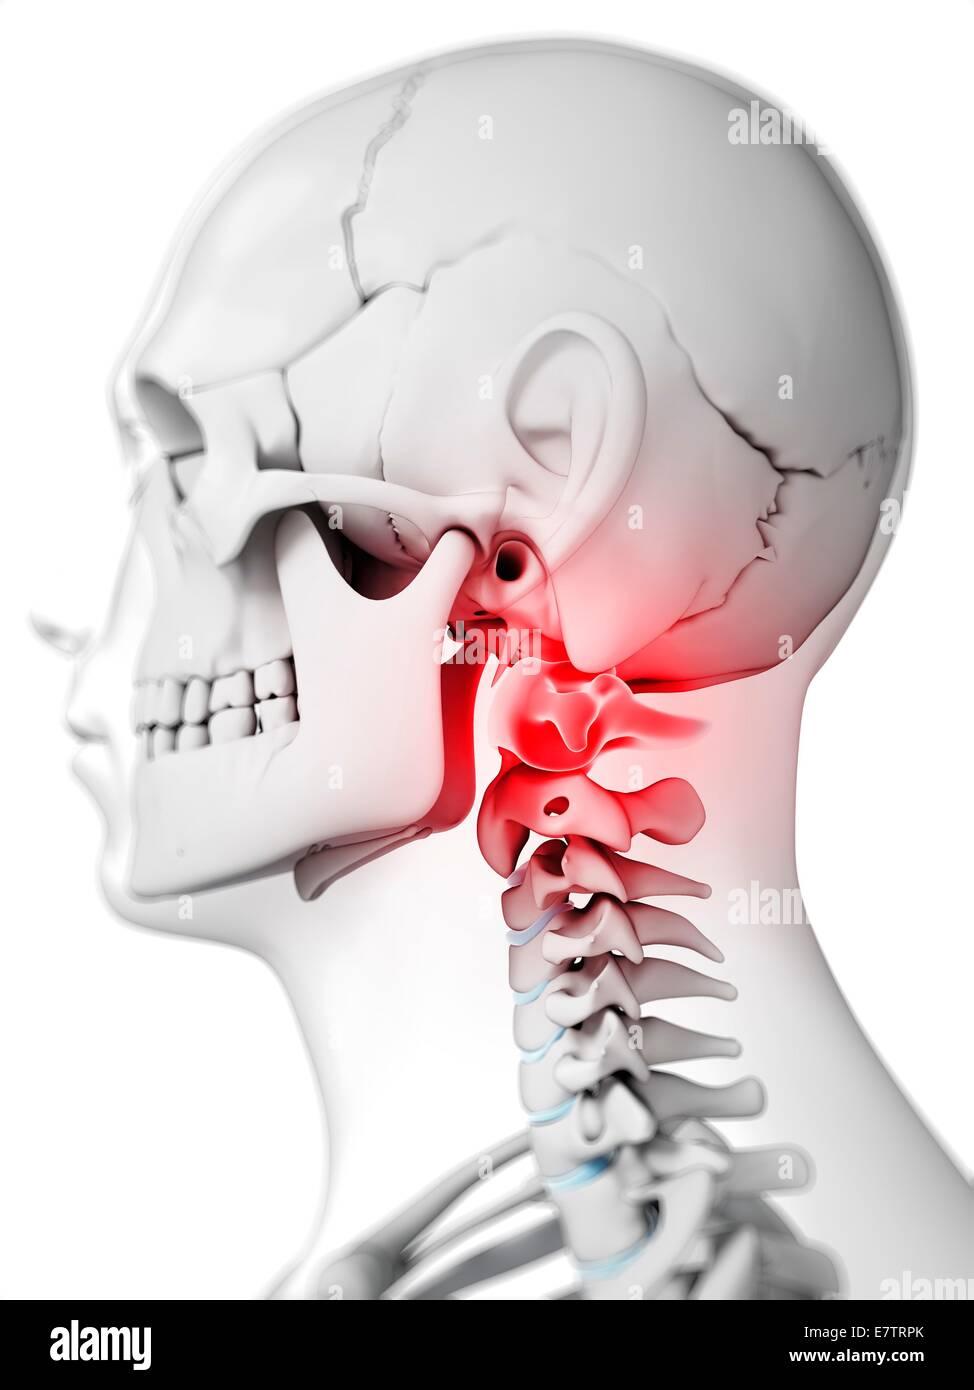 Human Neck Bones Computer Artwork Stock Photo 73689579 Alamy